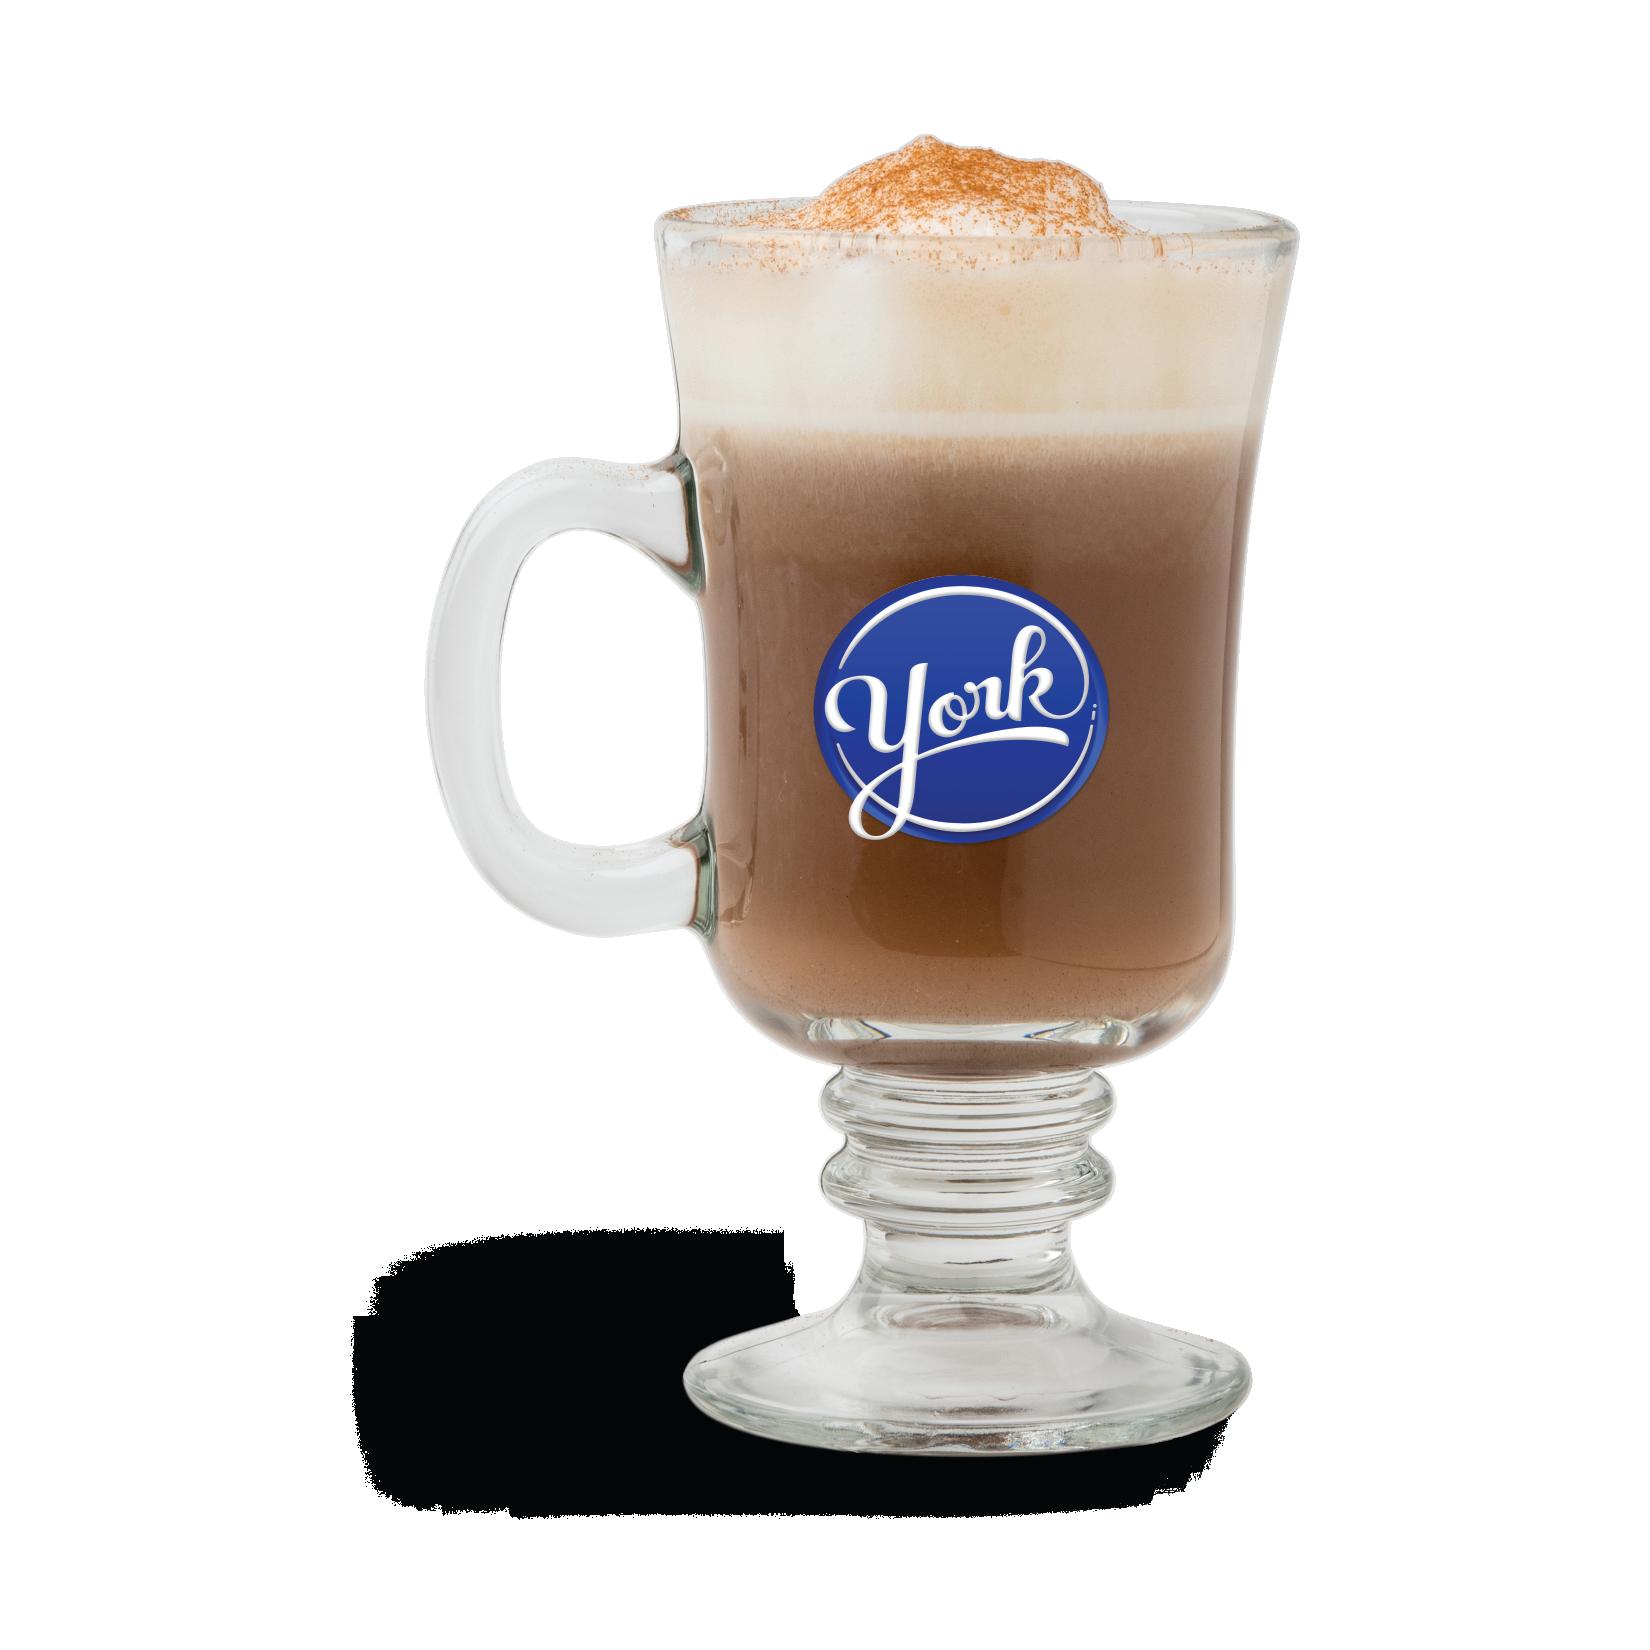 YORK Flavored Cappuccino